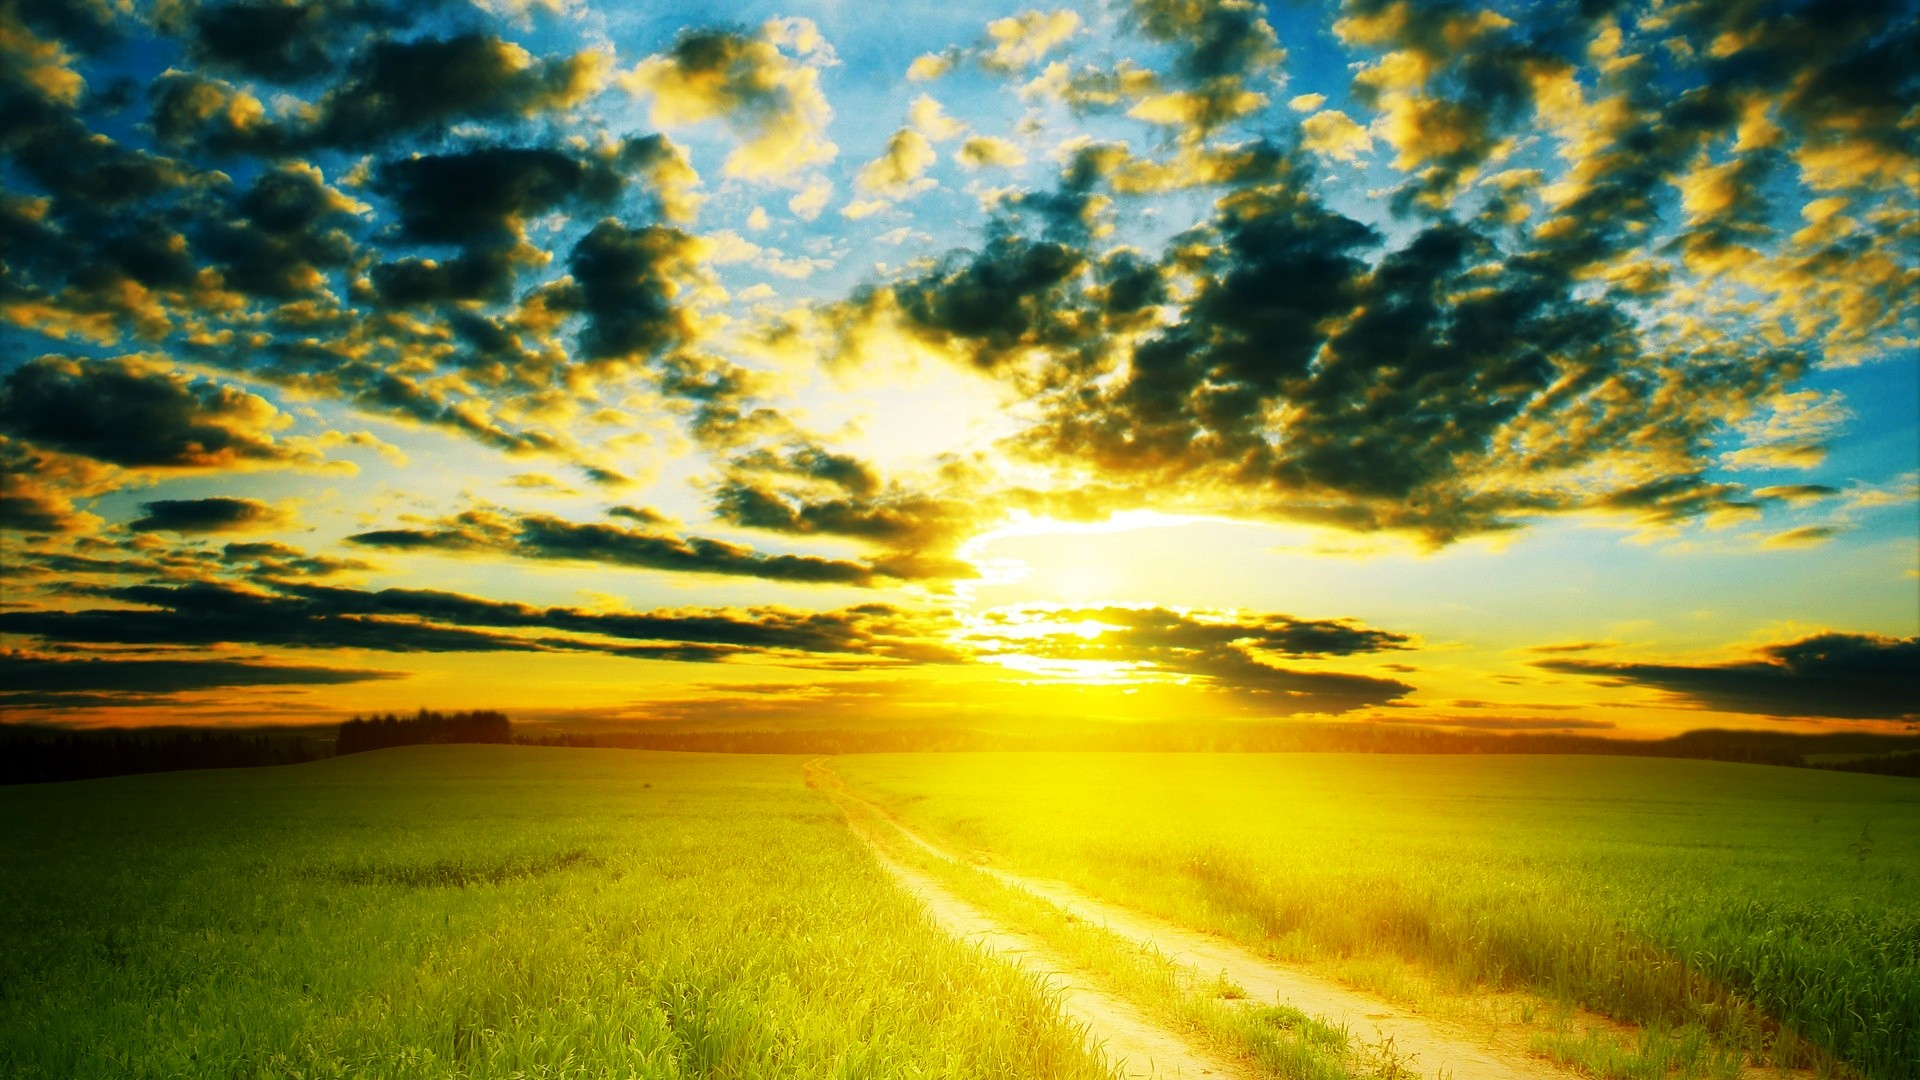 Beautiful Morning , HD Wallpaper & Backgrounds